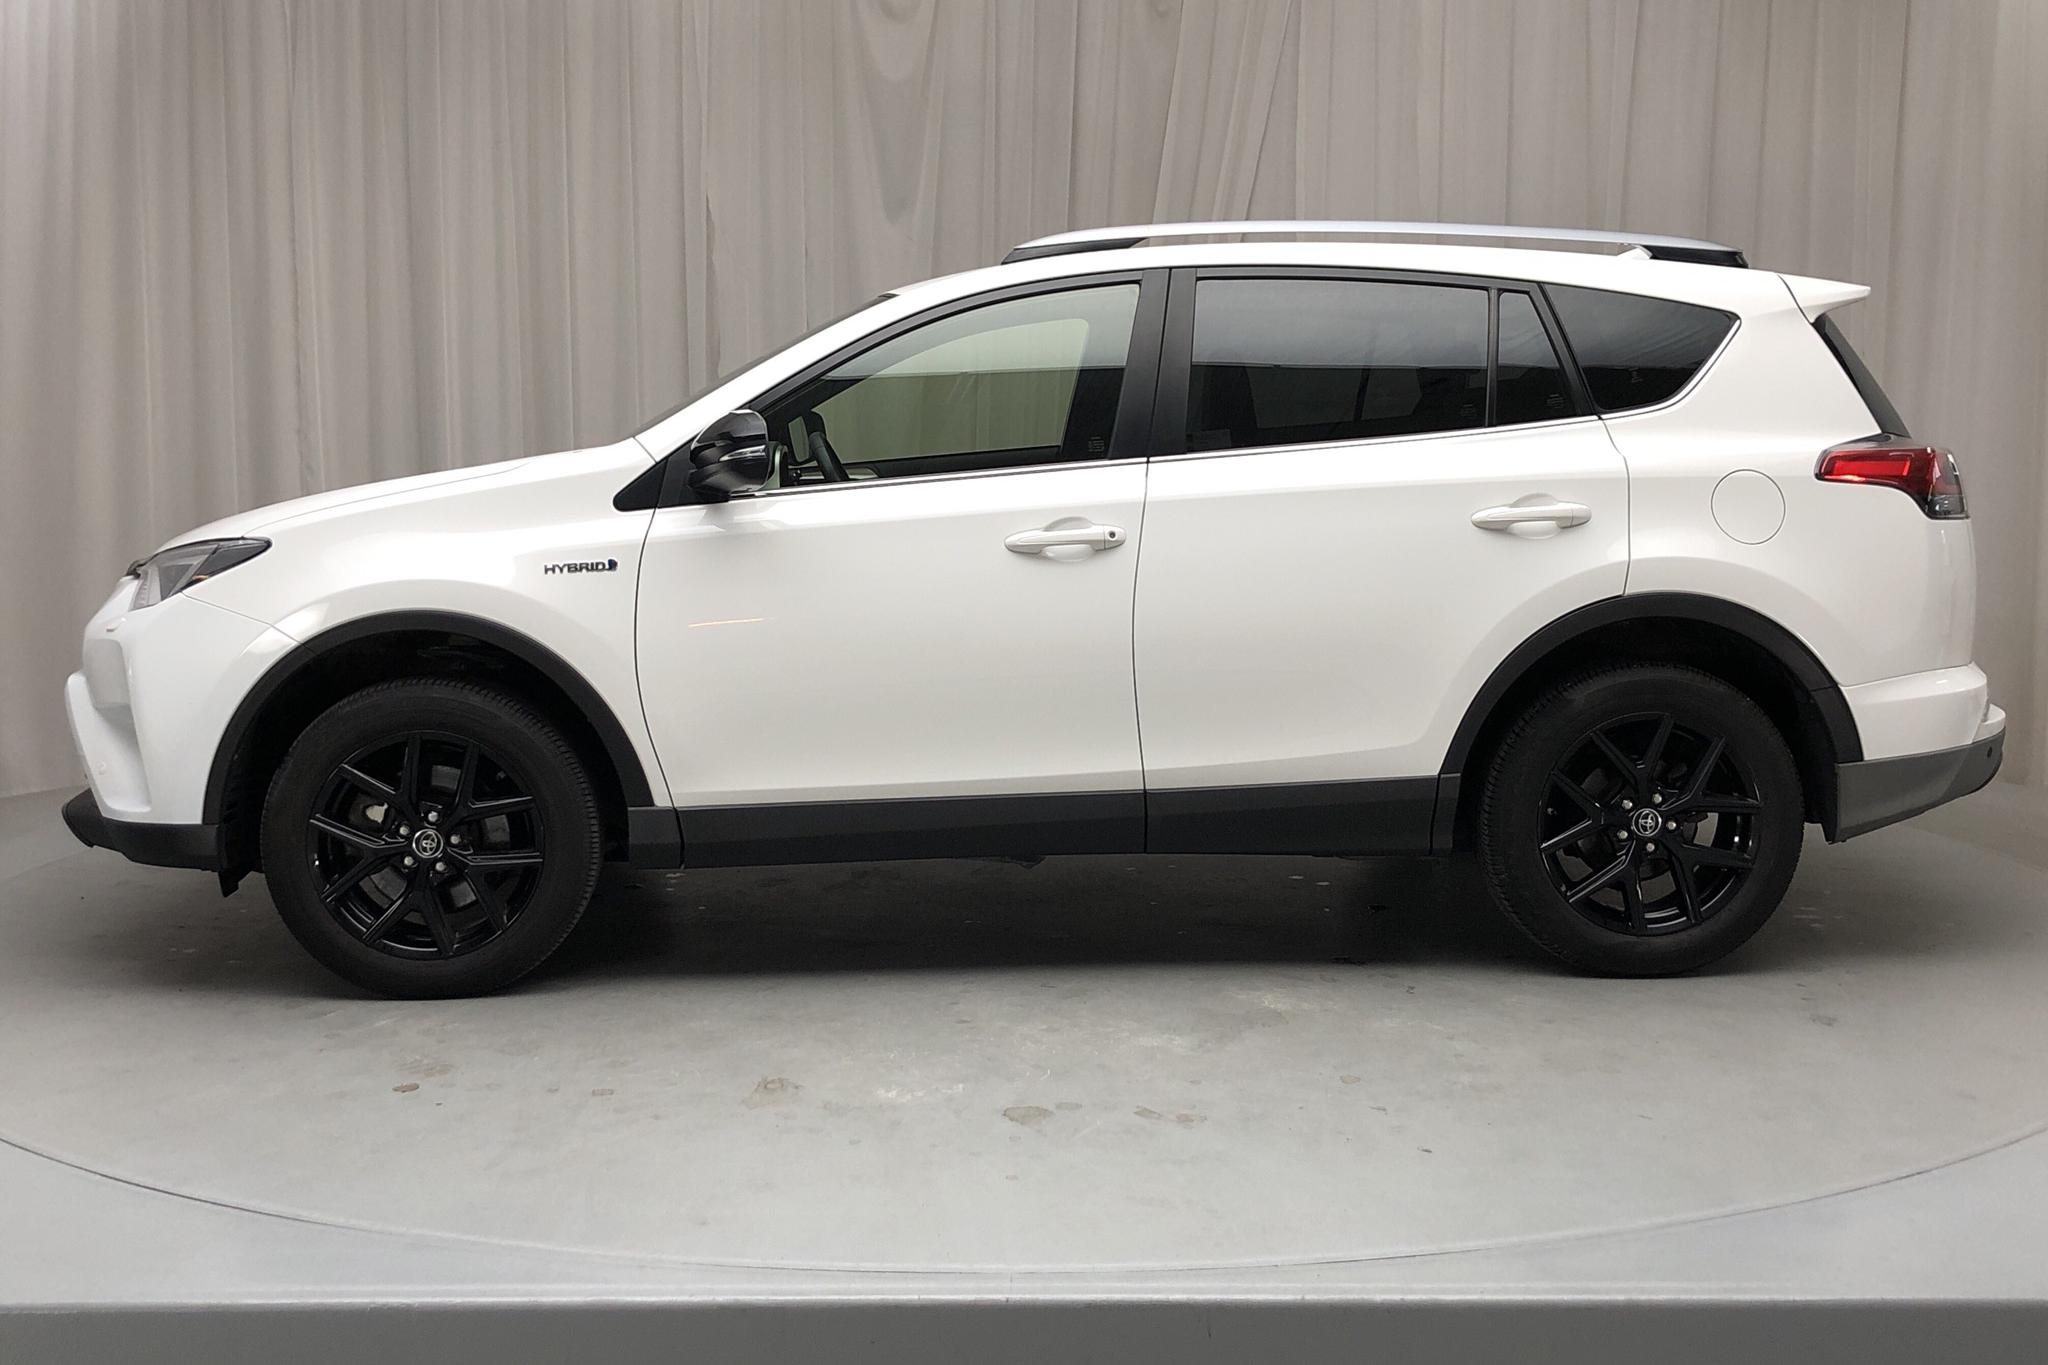 Toyota RAV4 2.5 HSD AWD (197hk) - 96 350 km - Automatic - white - 2018